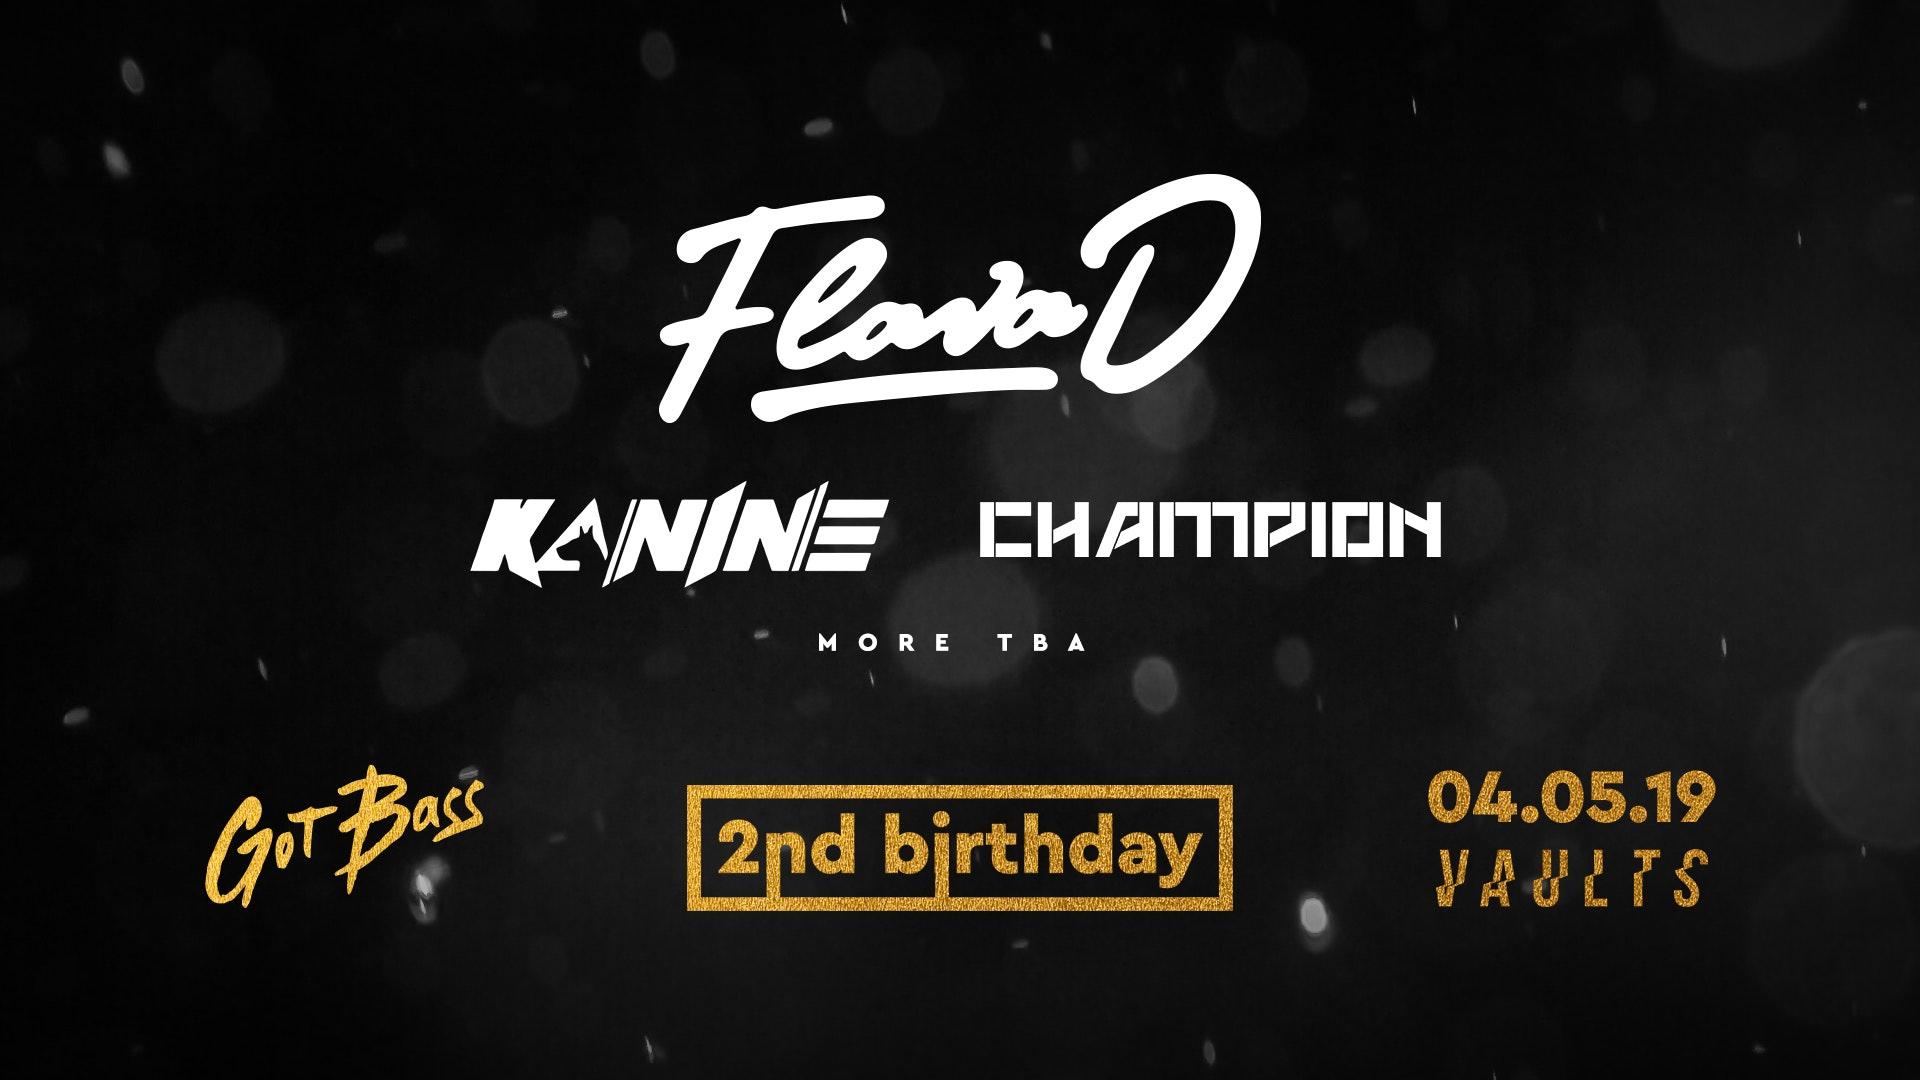 Got Bass 2nd Birthday w/ Flava D, Kanine, Champion & more…